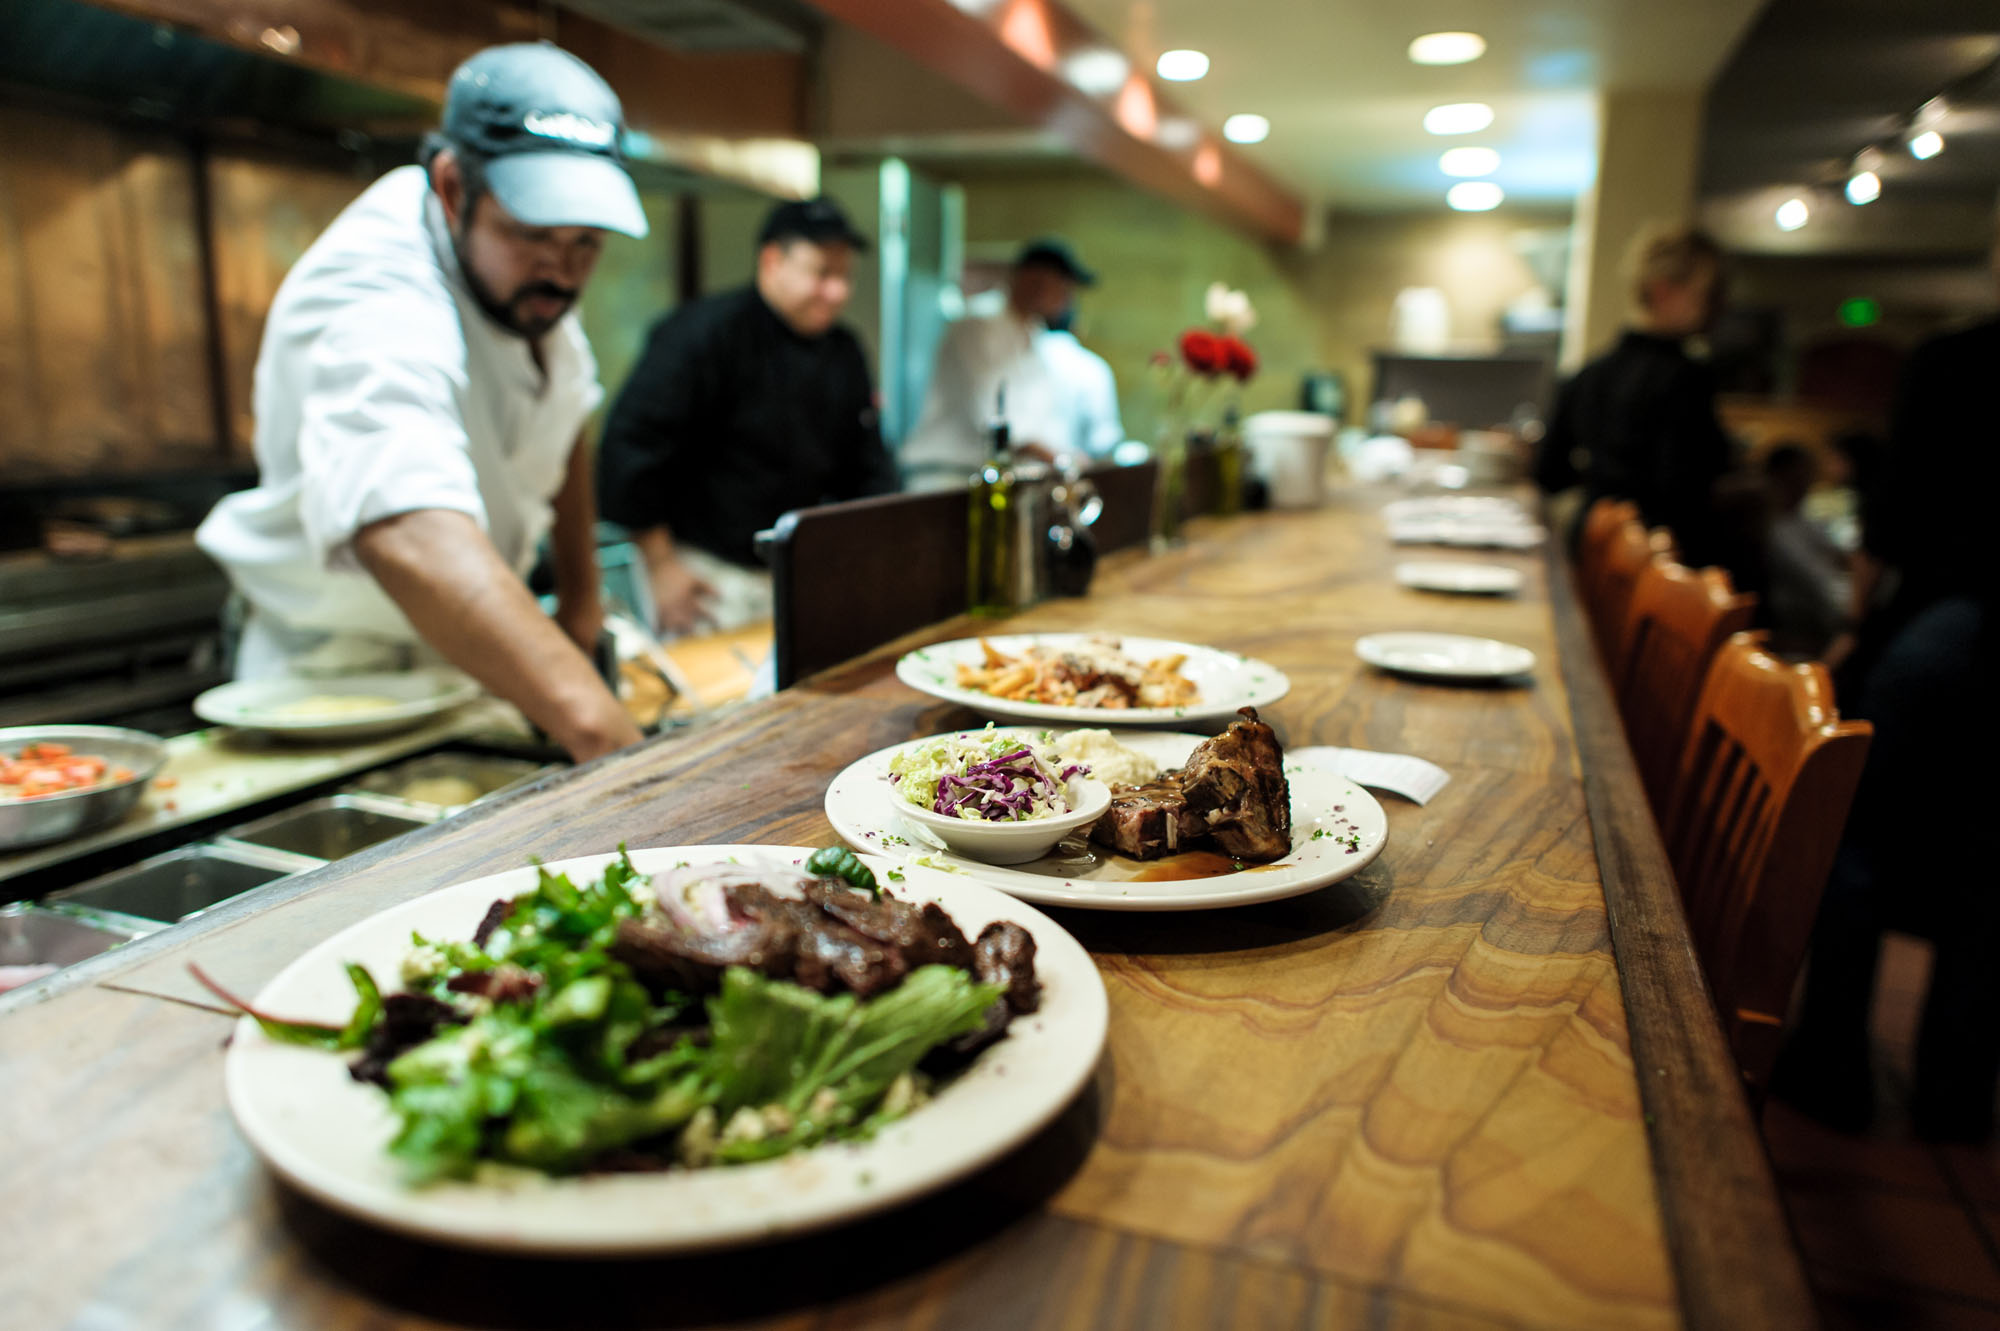 3822-d3_Cafe_Cruz_Soquel_Restaurant_Lifestyle_Photography.jpg